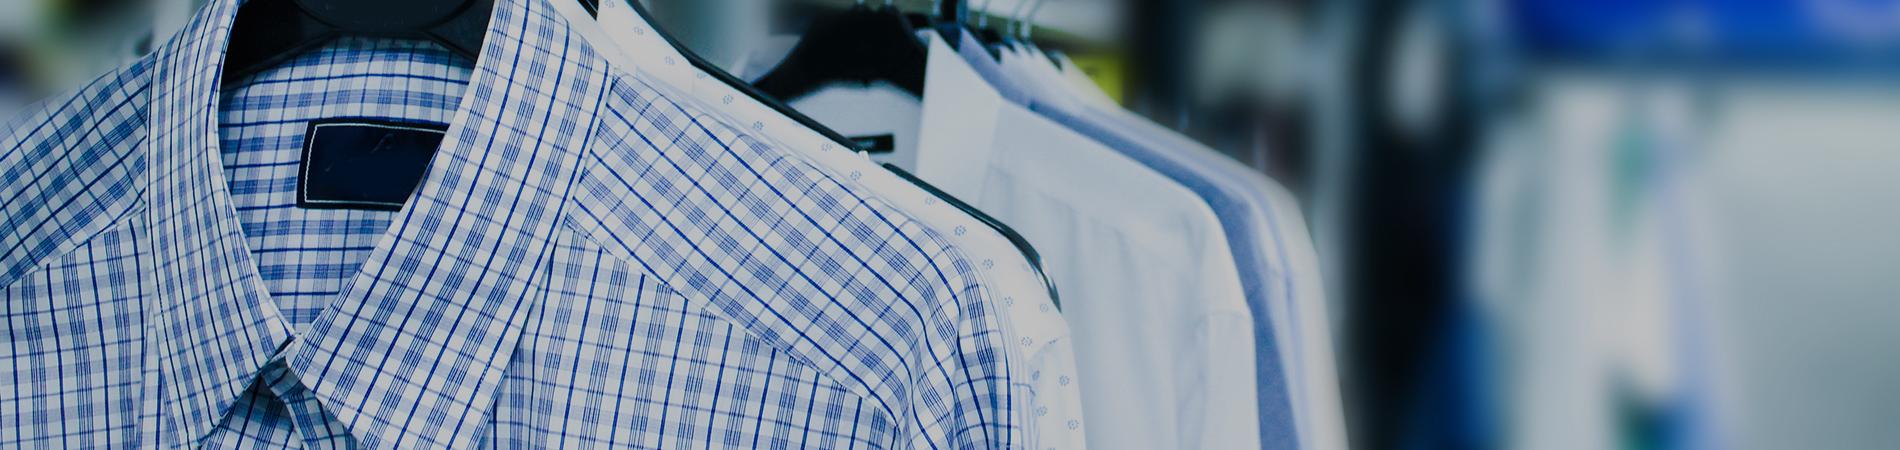 New Era Cleaners & Laundry